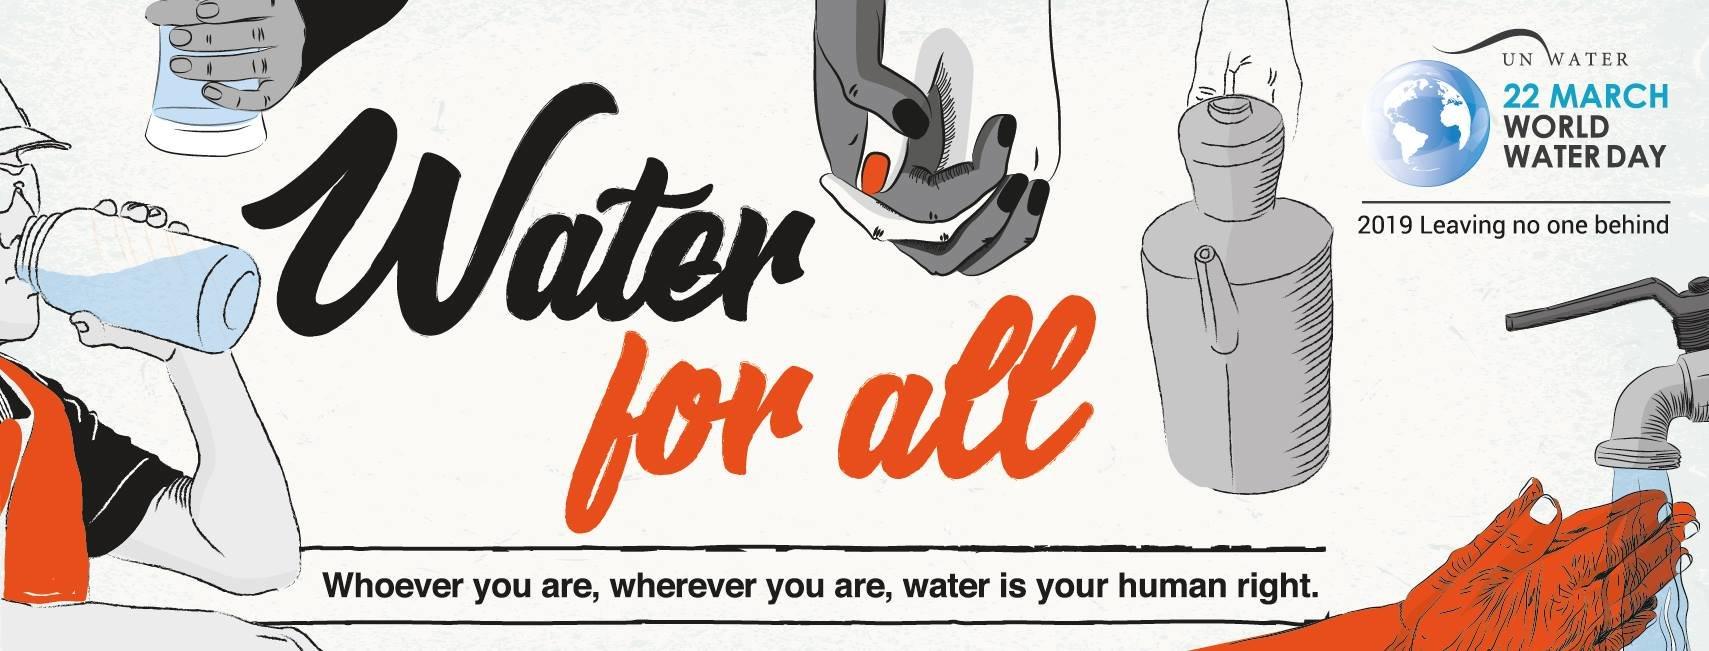 Celebrating World Water Day